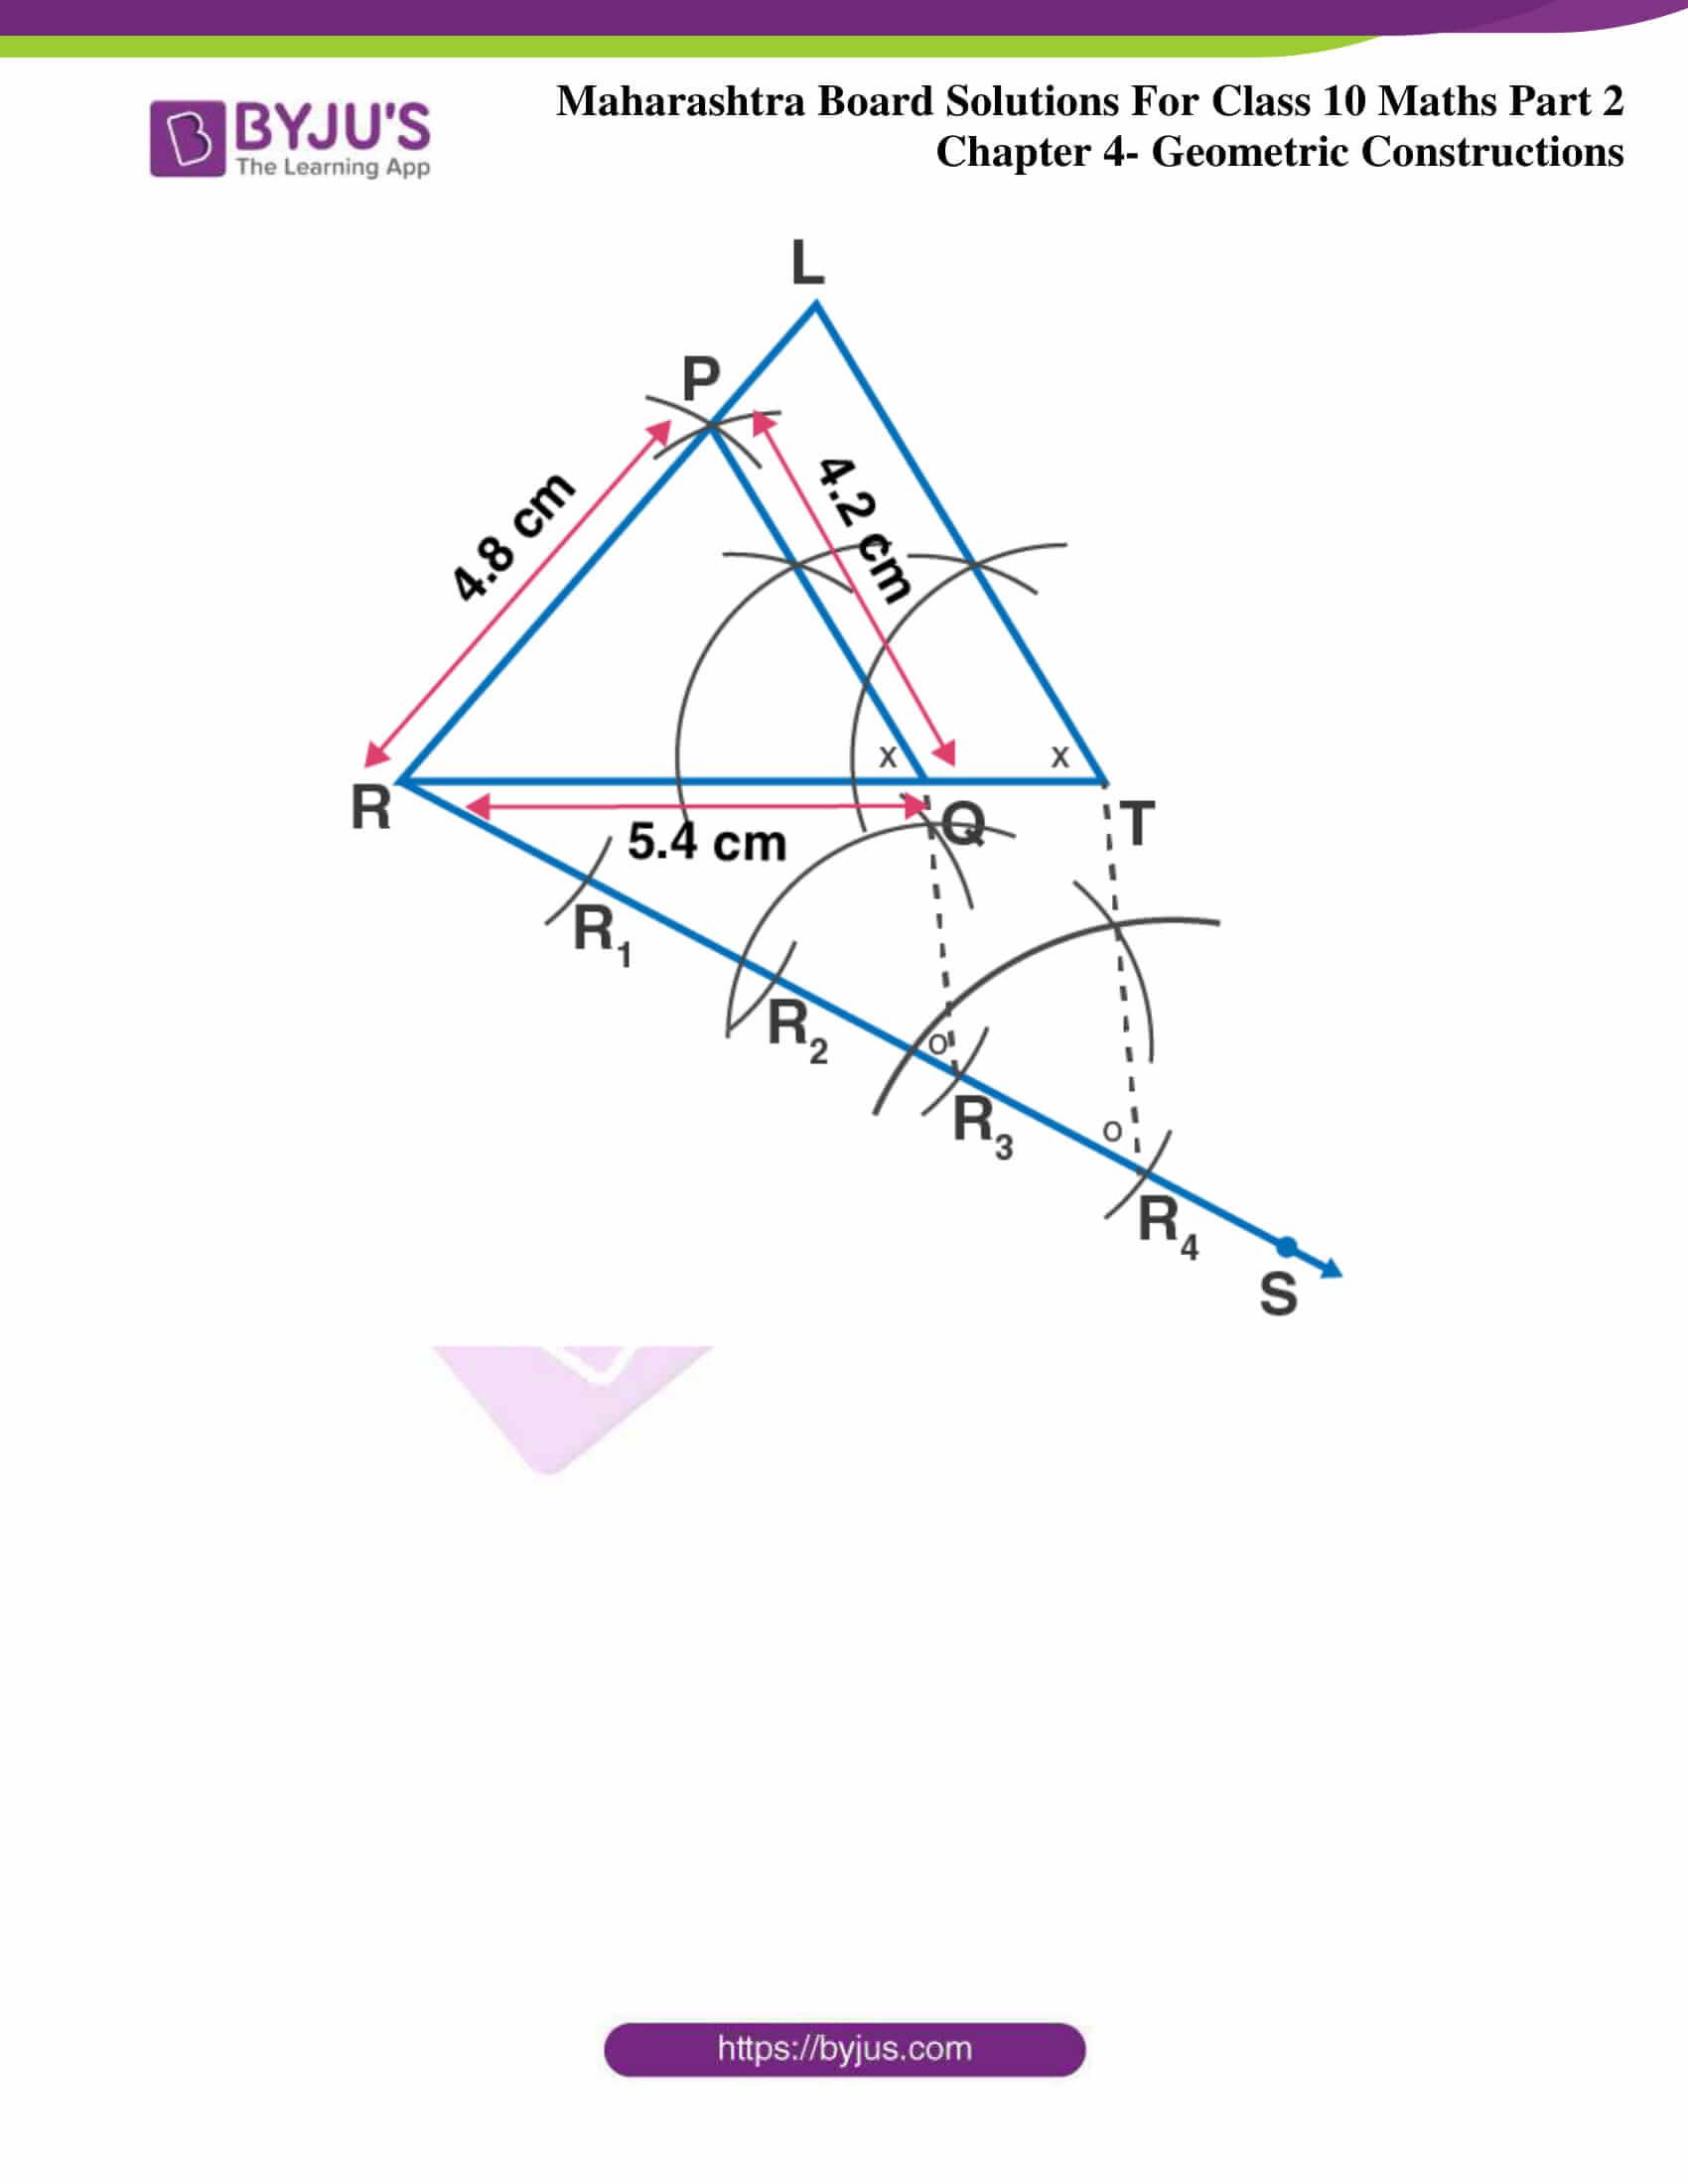 msbshse sol class 10 maths part 2 chapter 4 03